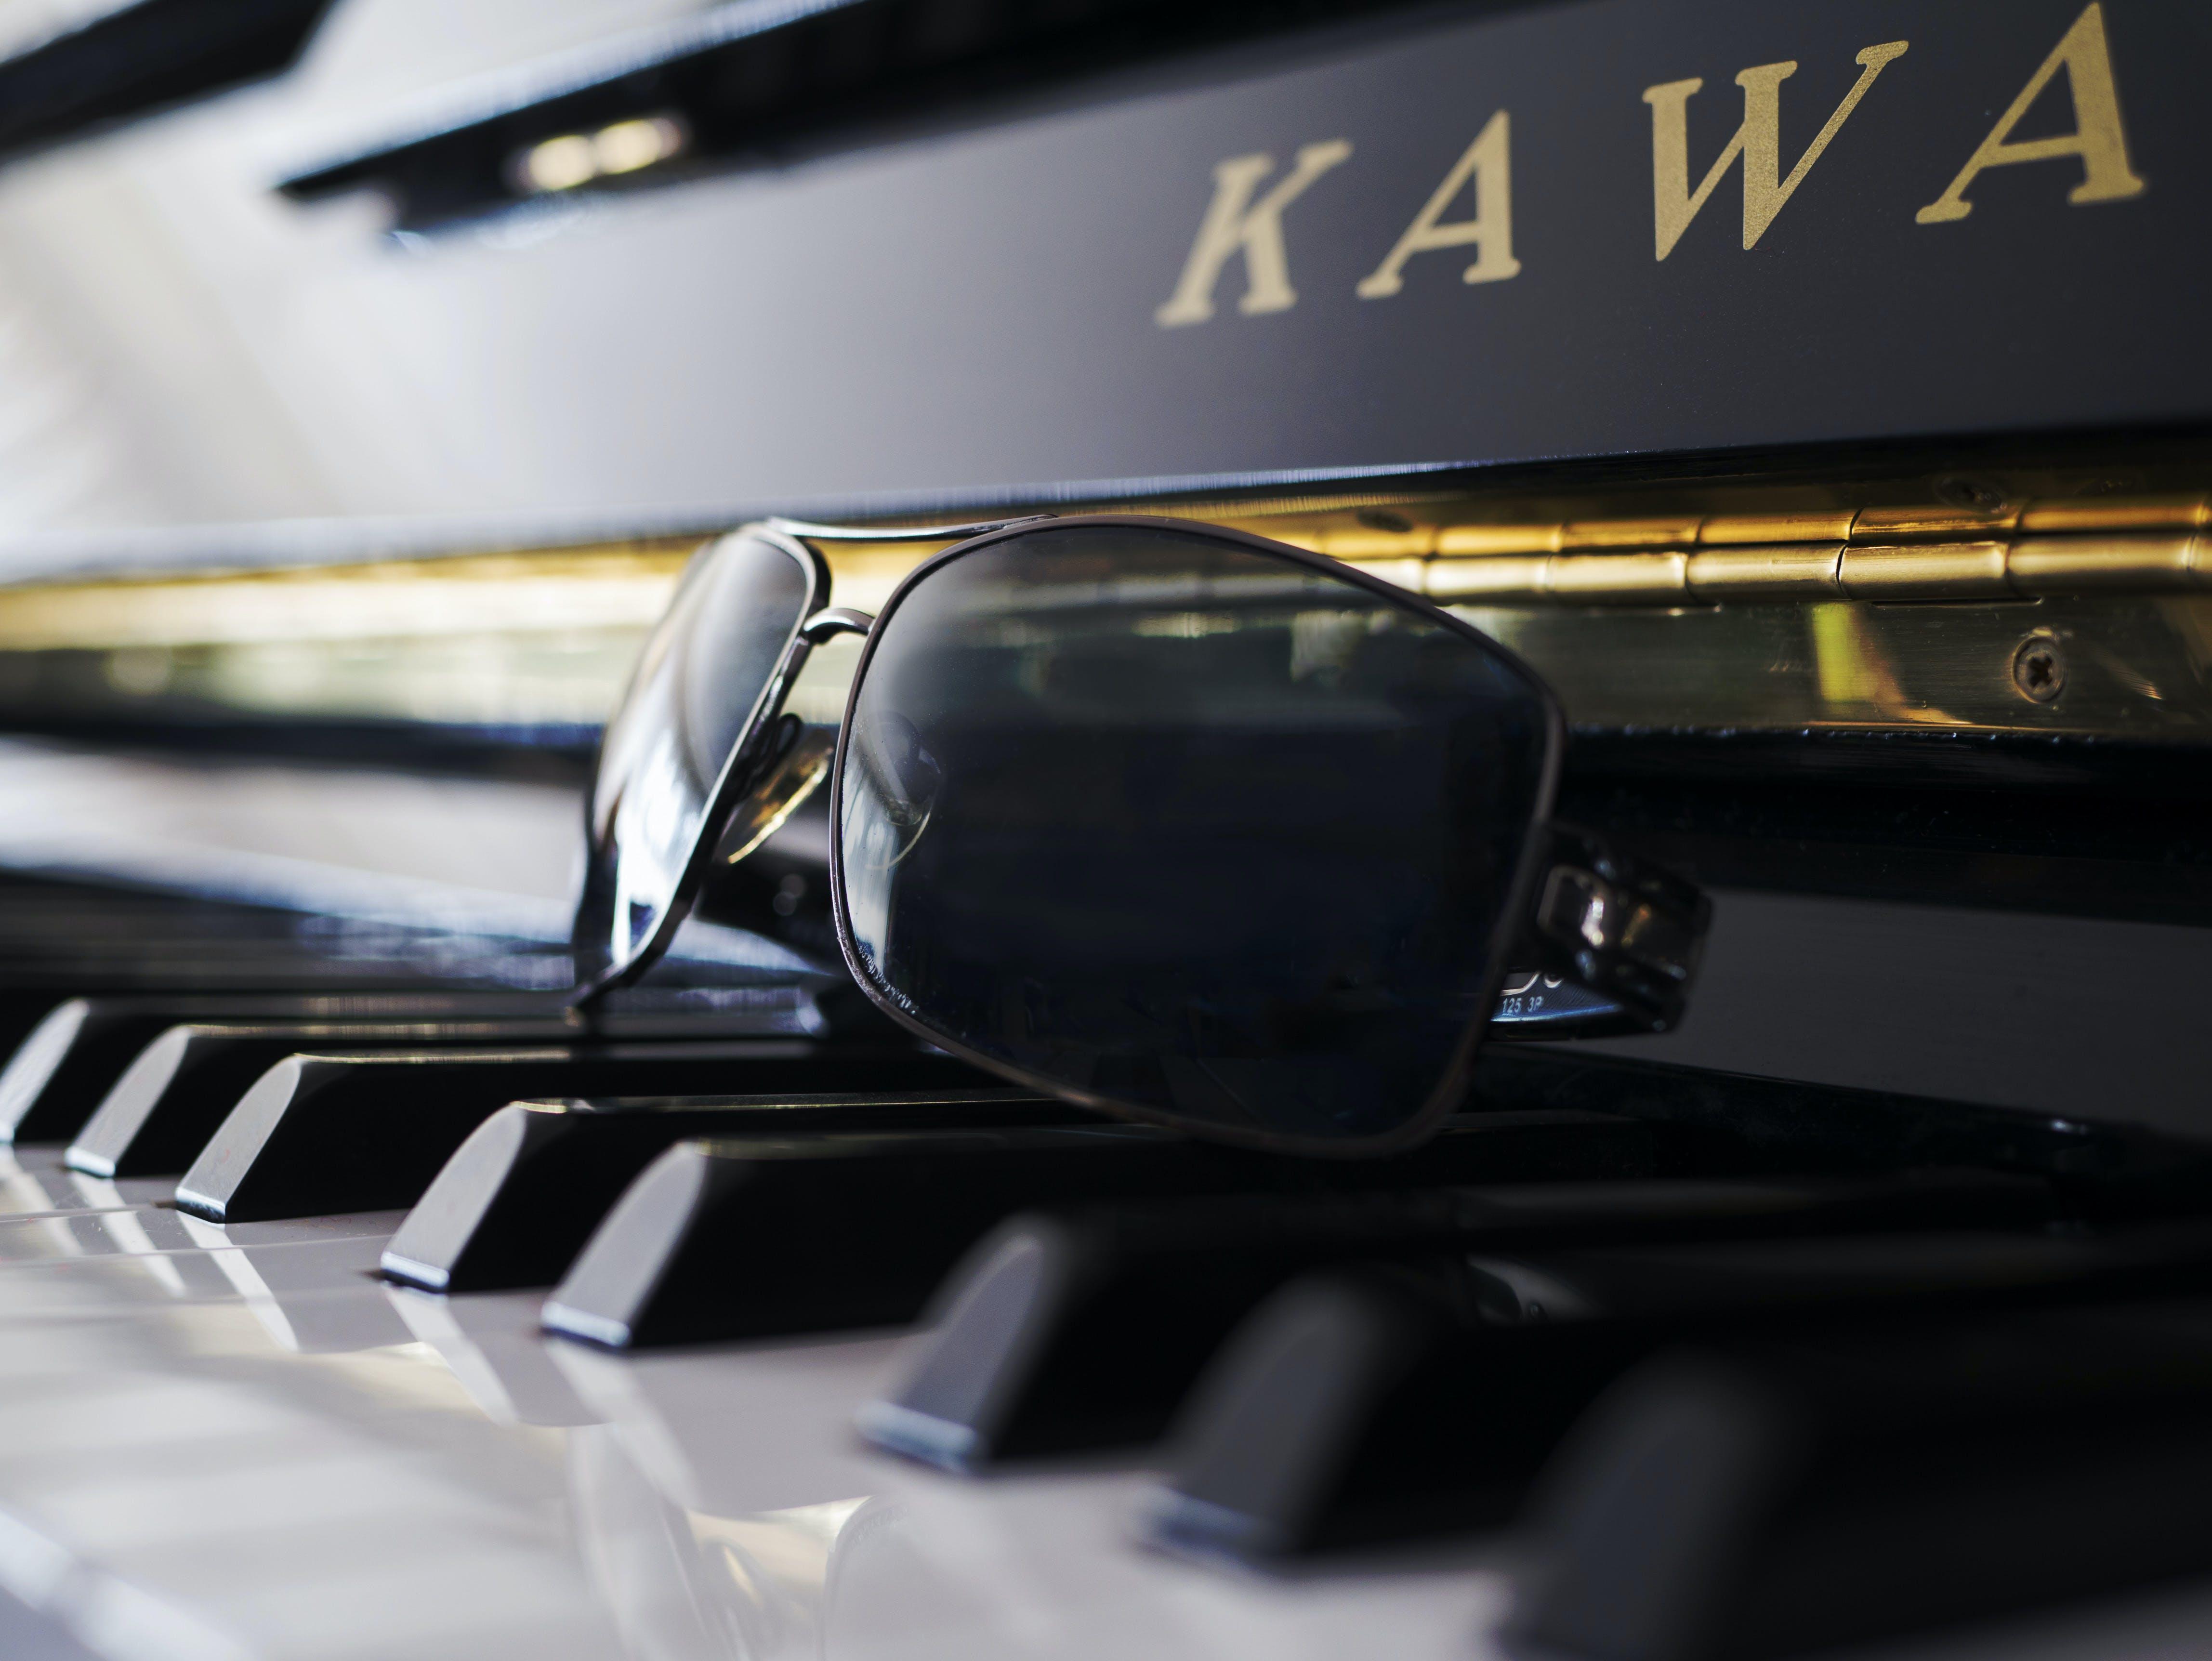 Free stock photo of sunglasses, music, piano, black